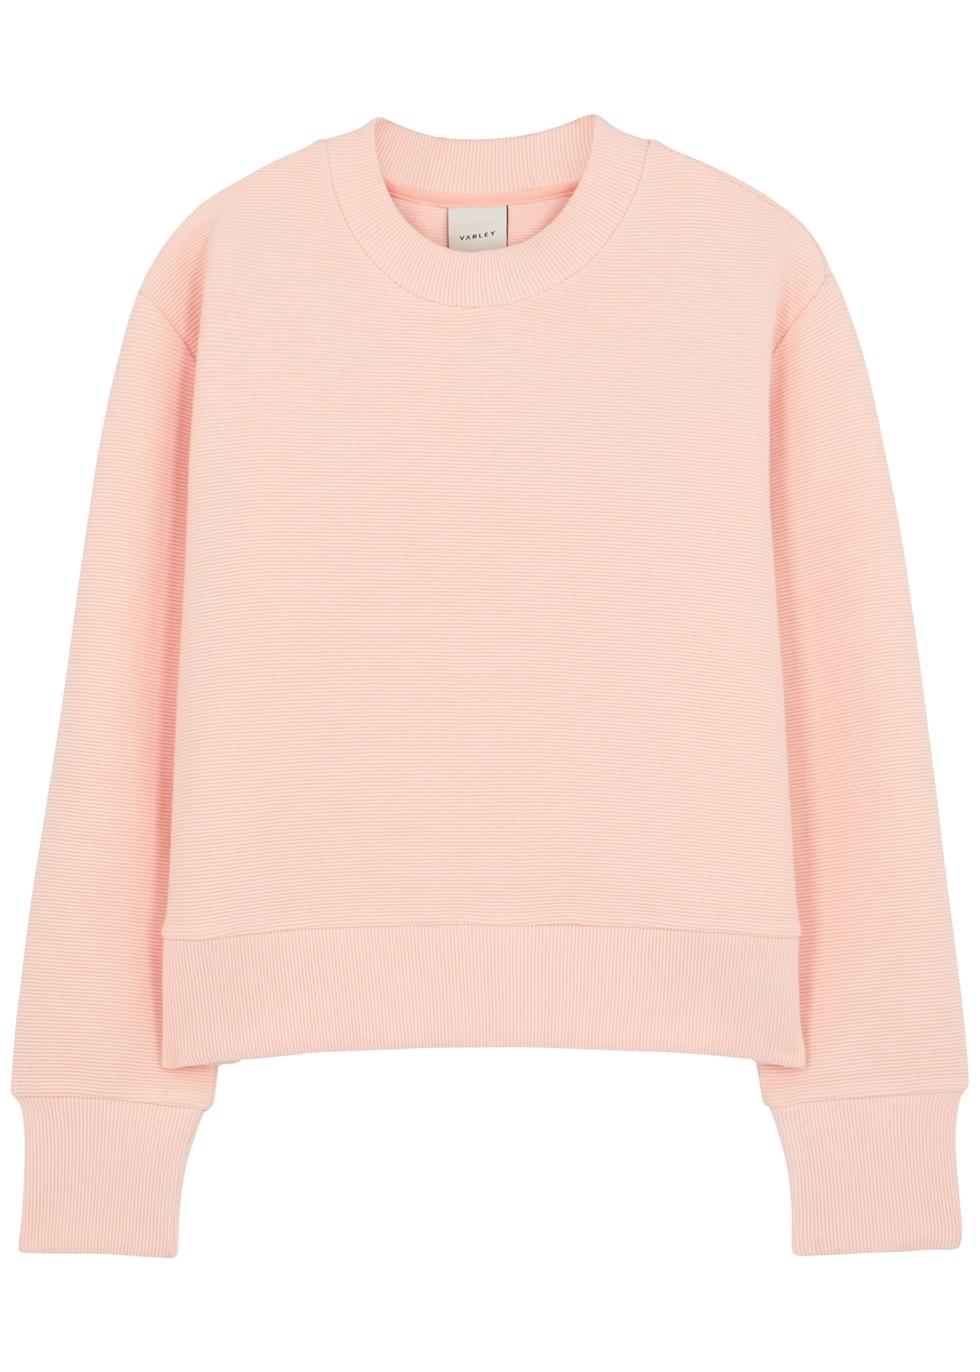 Cleon pink ribbed jersey sweatshirt